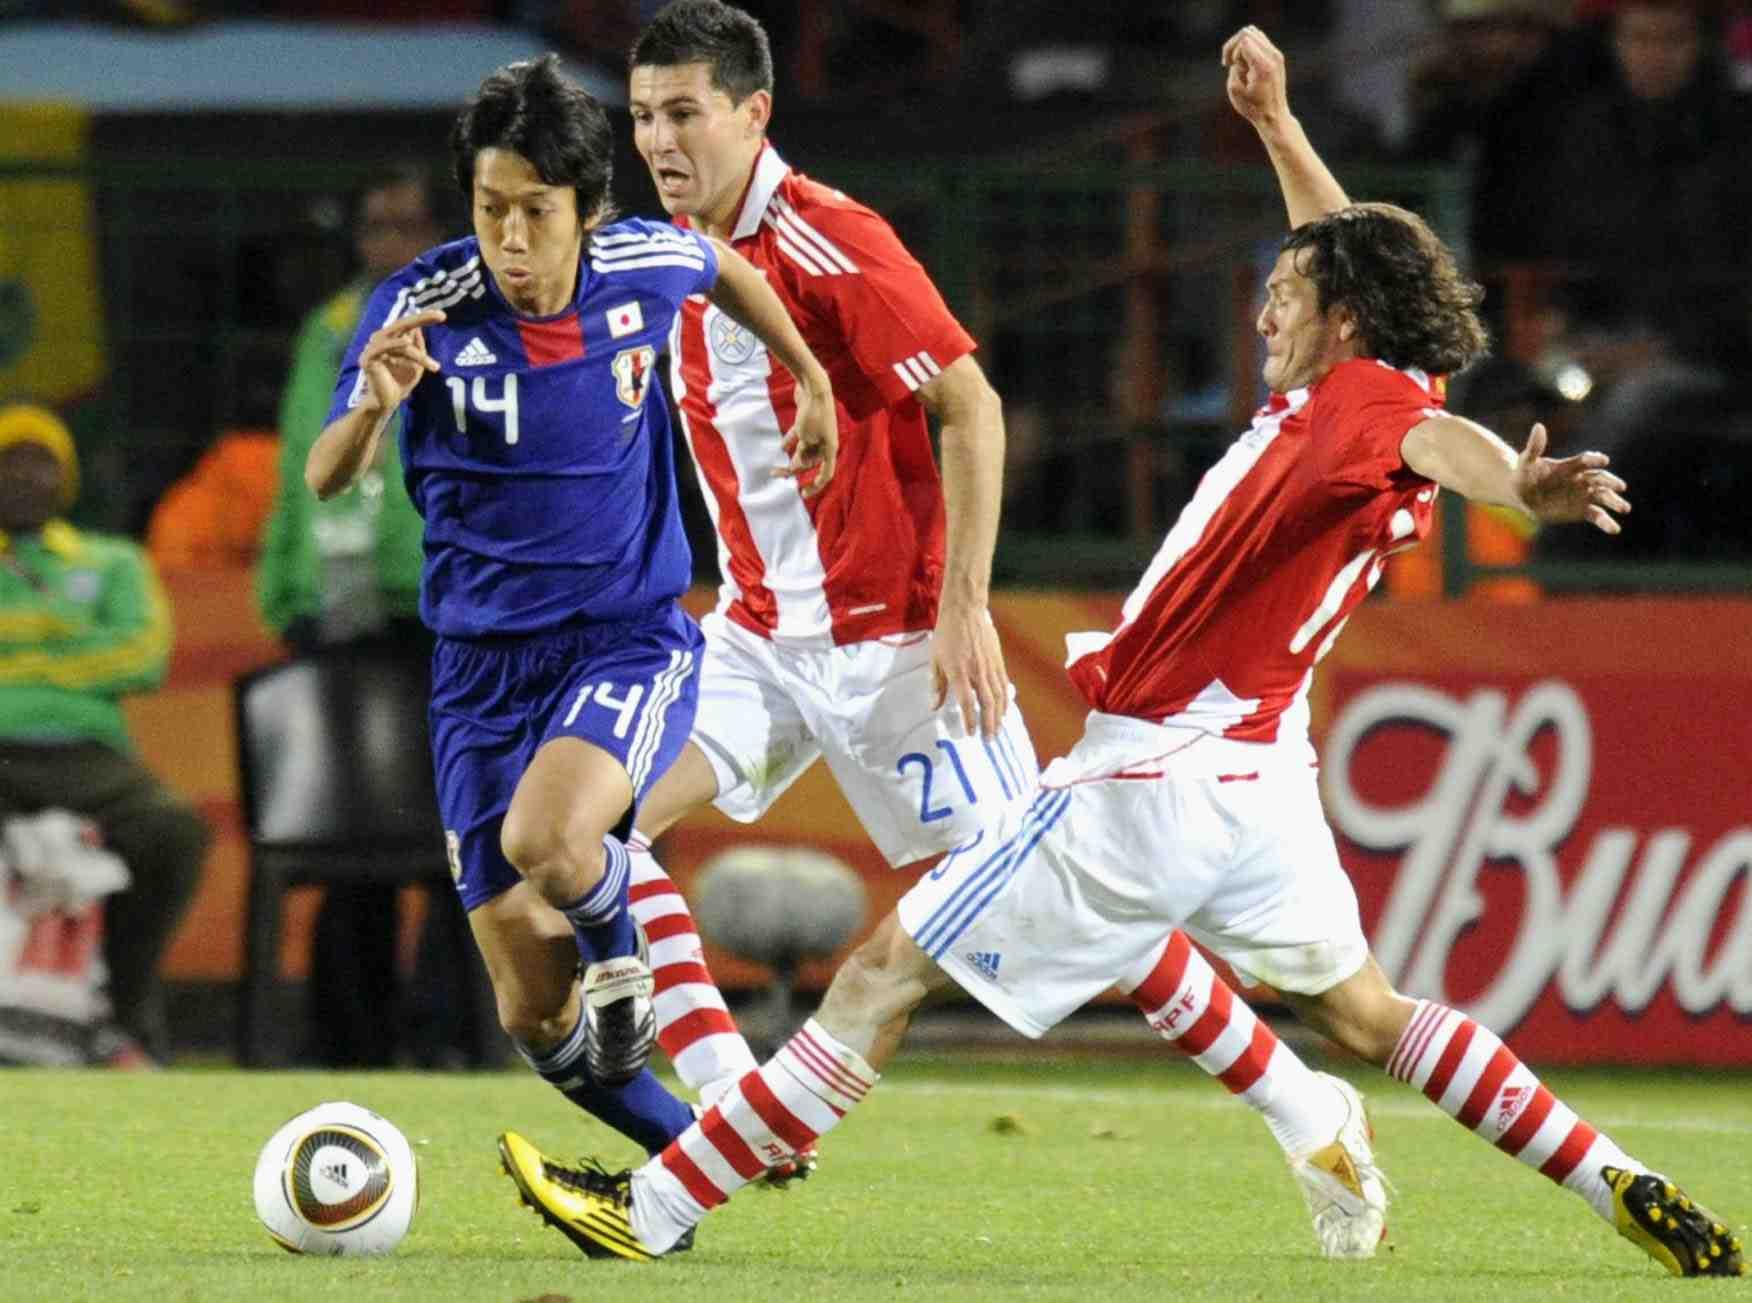 Soccer Kawasaki Frontale player Kengo Nakamura 008